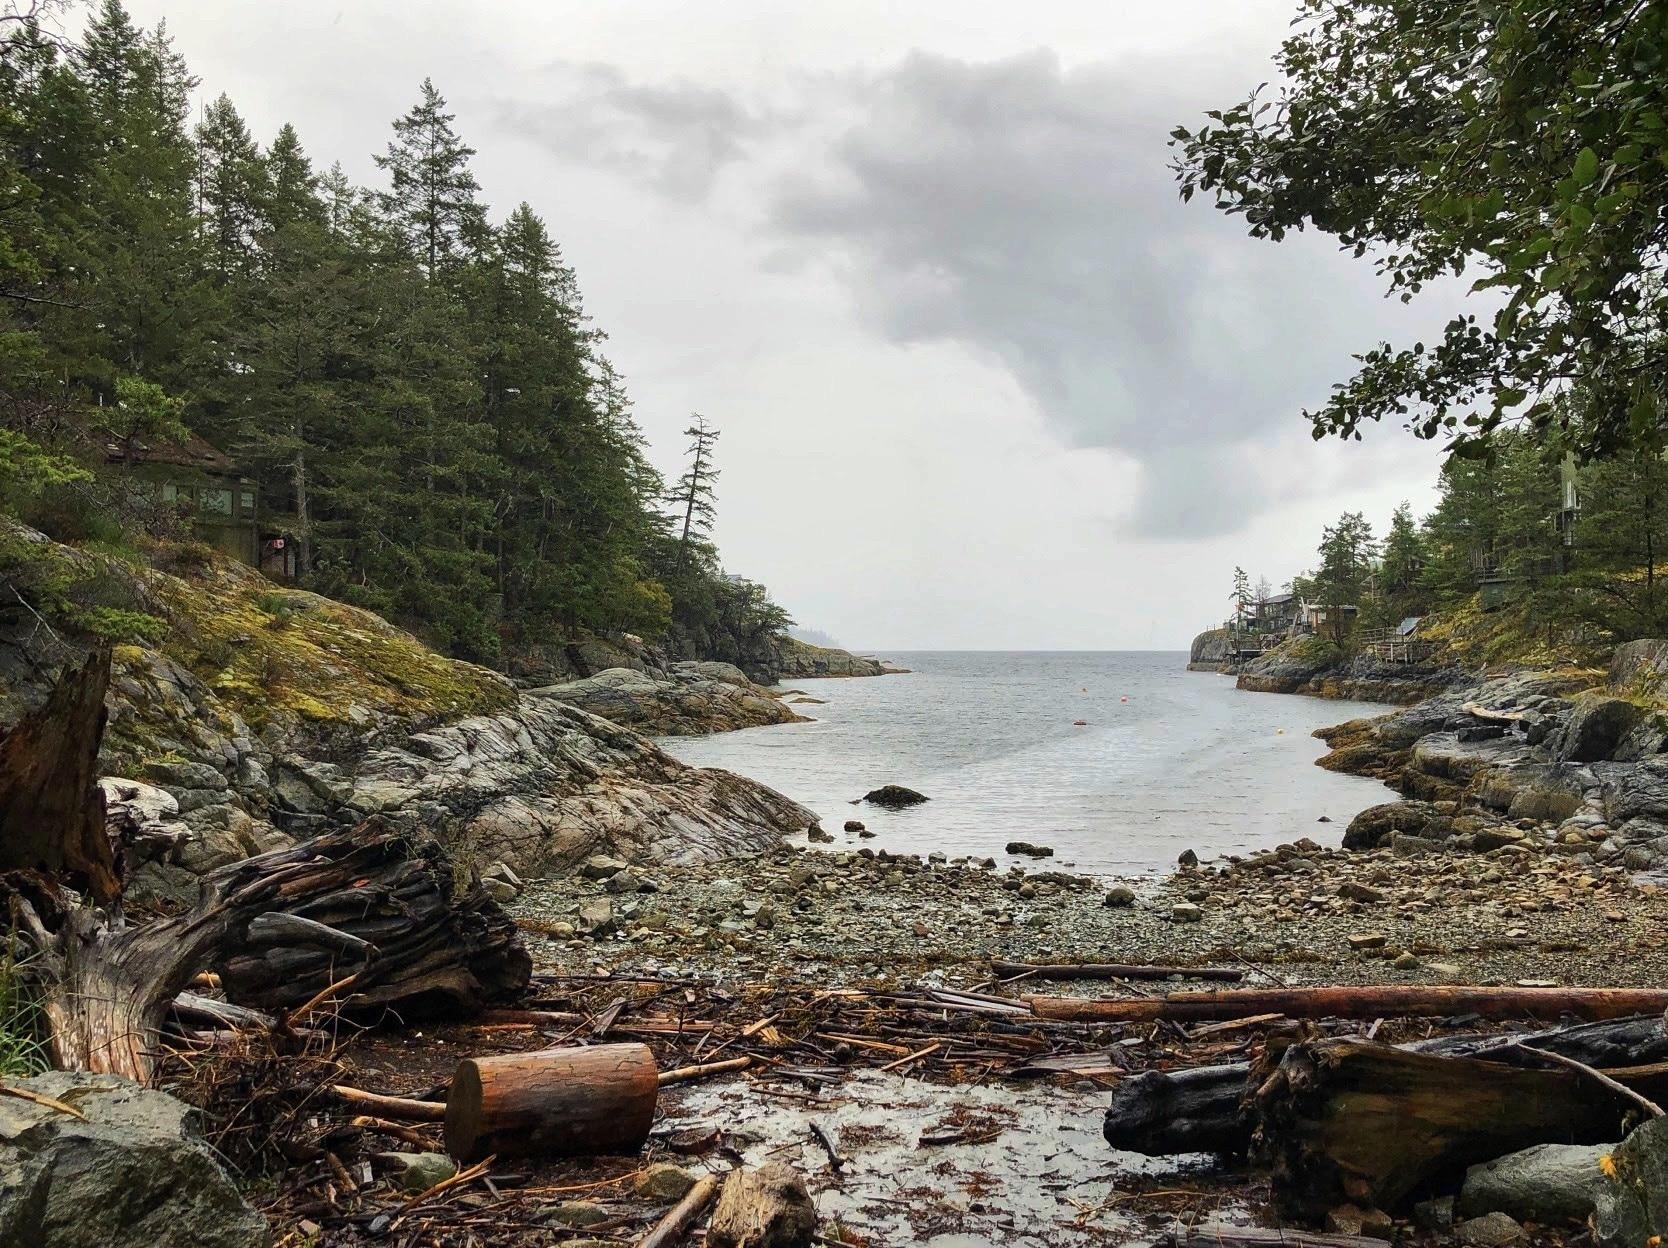 Smuggler Cove Marine Provincial Park, Halfmoon Bay, British Columbia, Canada